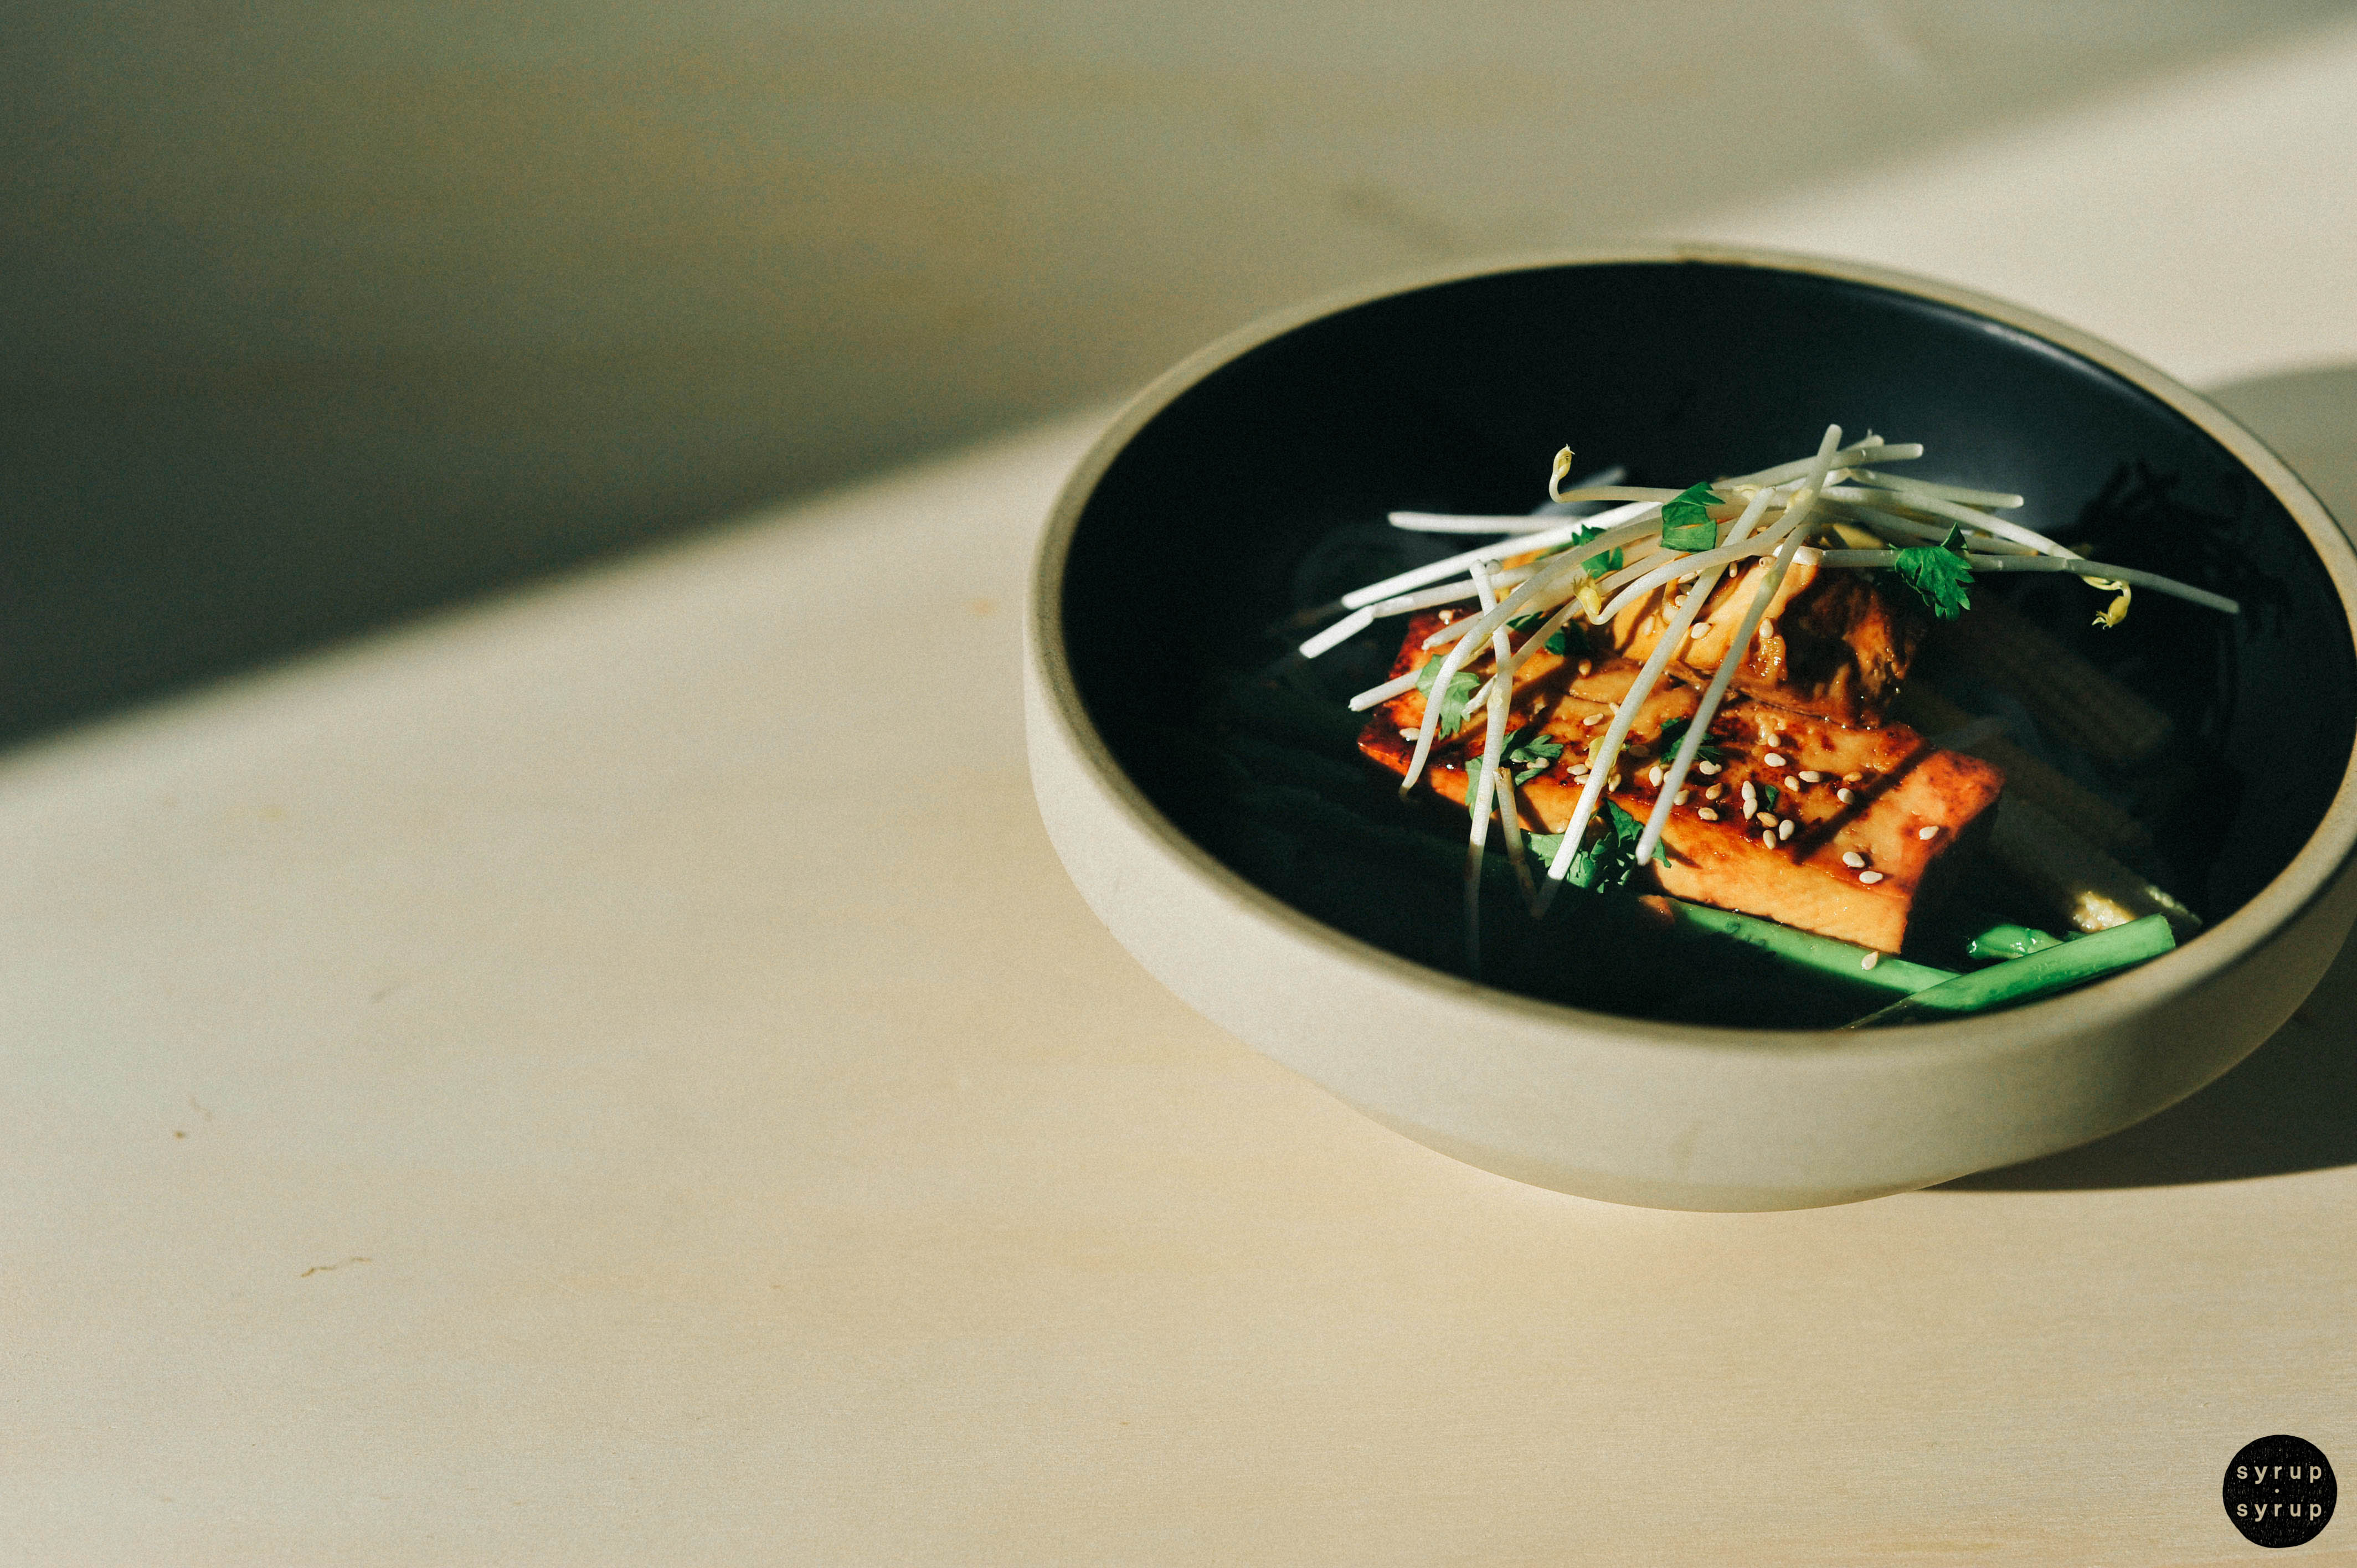 vegane asia pfanne 03 final - Konjak-Nudeln mit Teriyakitofu und Gemüse